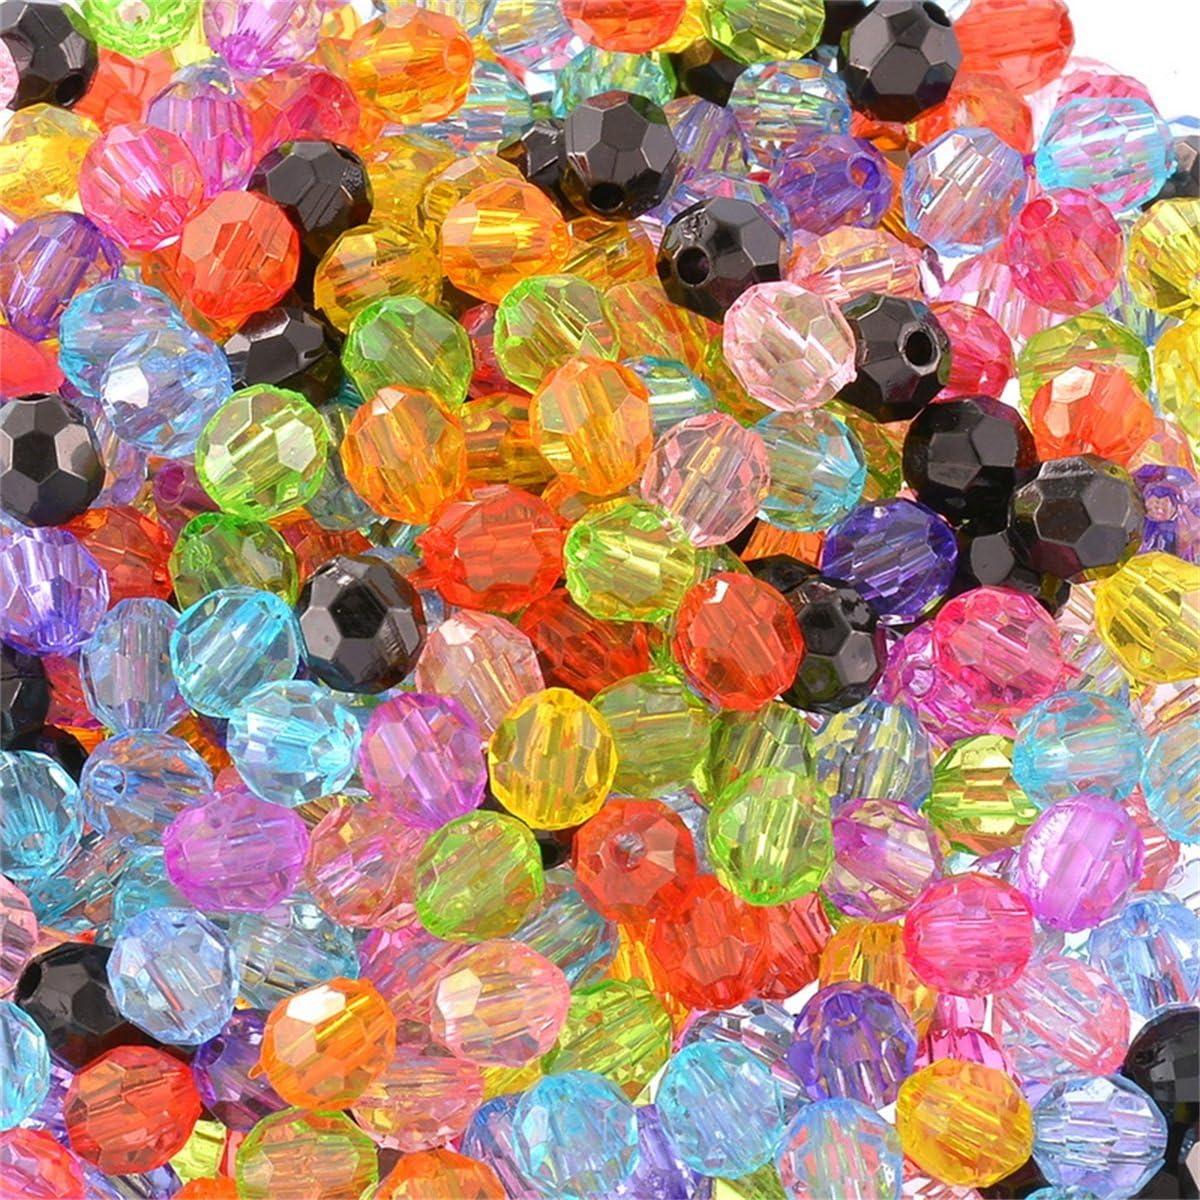 Cristal transparente de anilla bicónica ab-colored facetas de perlas de acrílico agujero pequeño